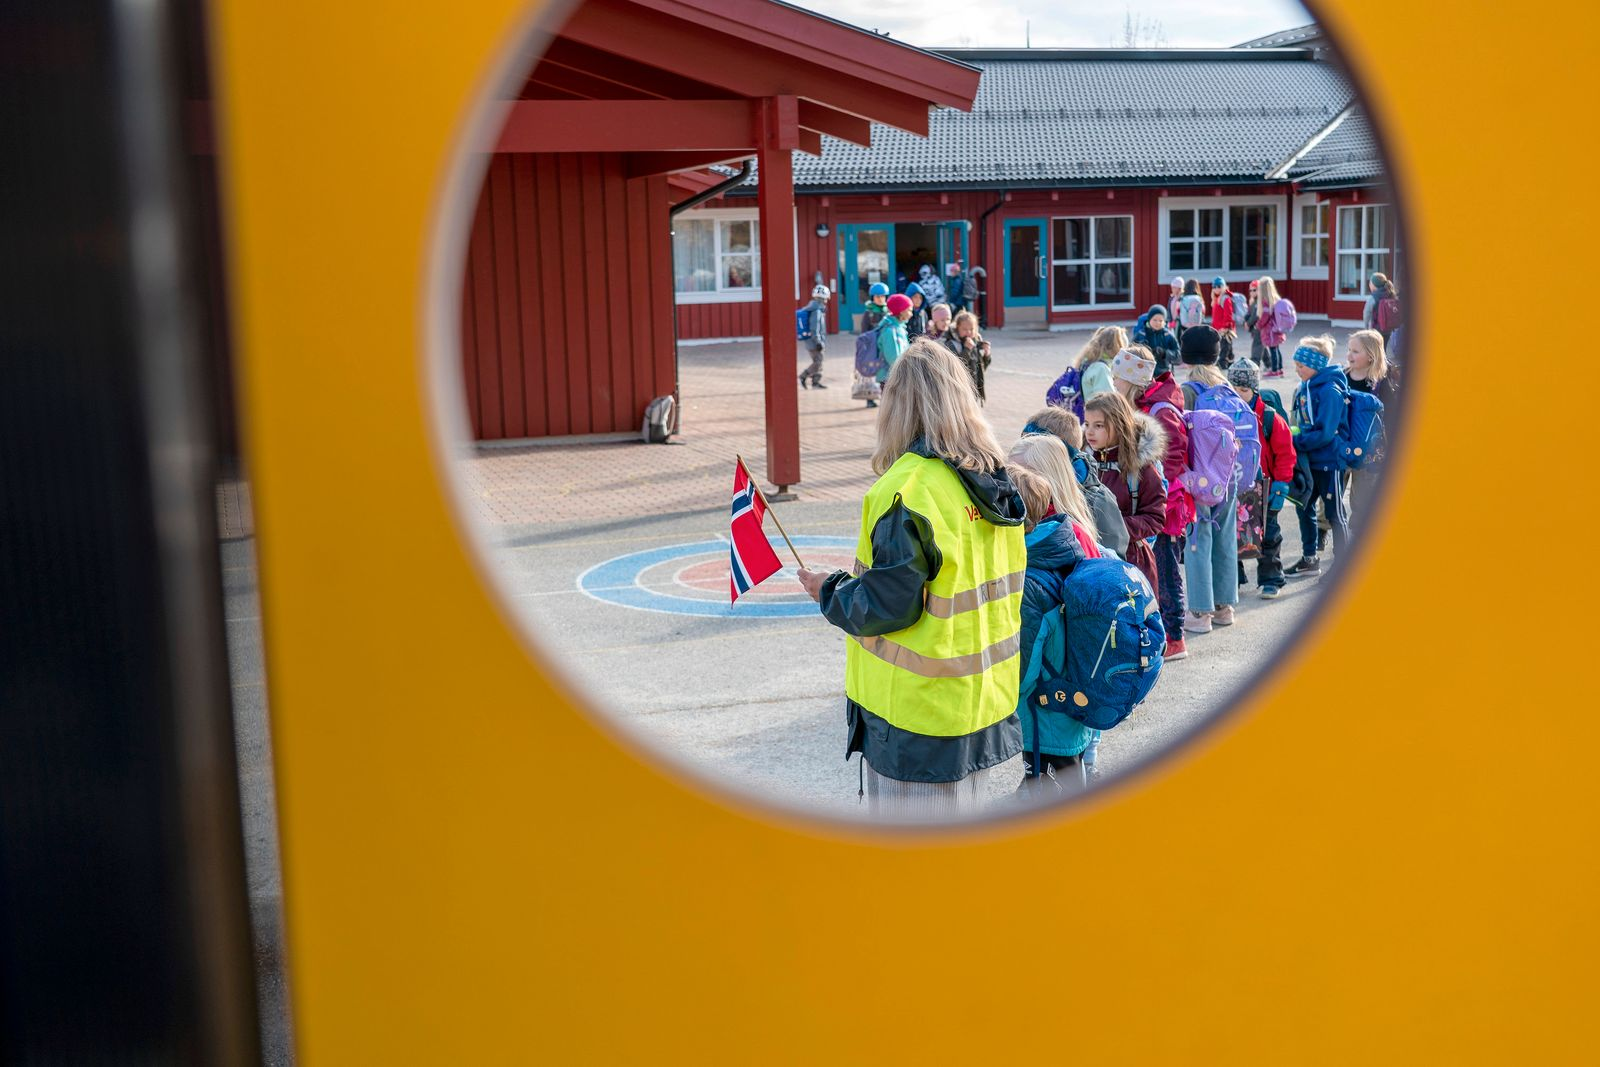 Vikåsen school in Trondheim opens again after the coronavirus outbreak